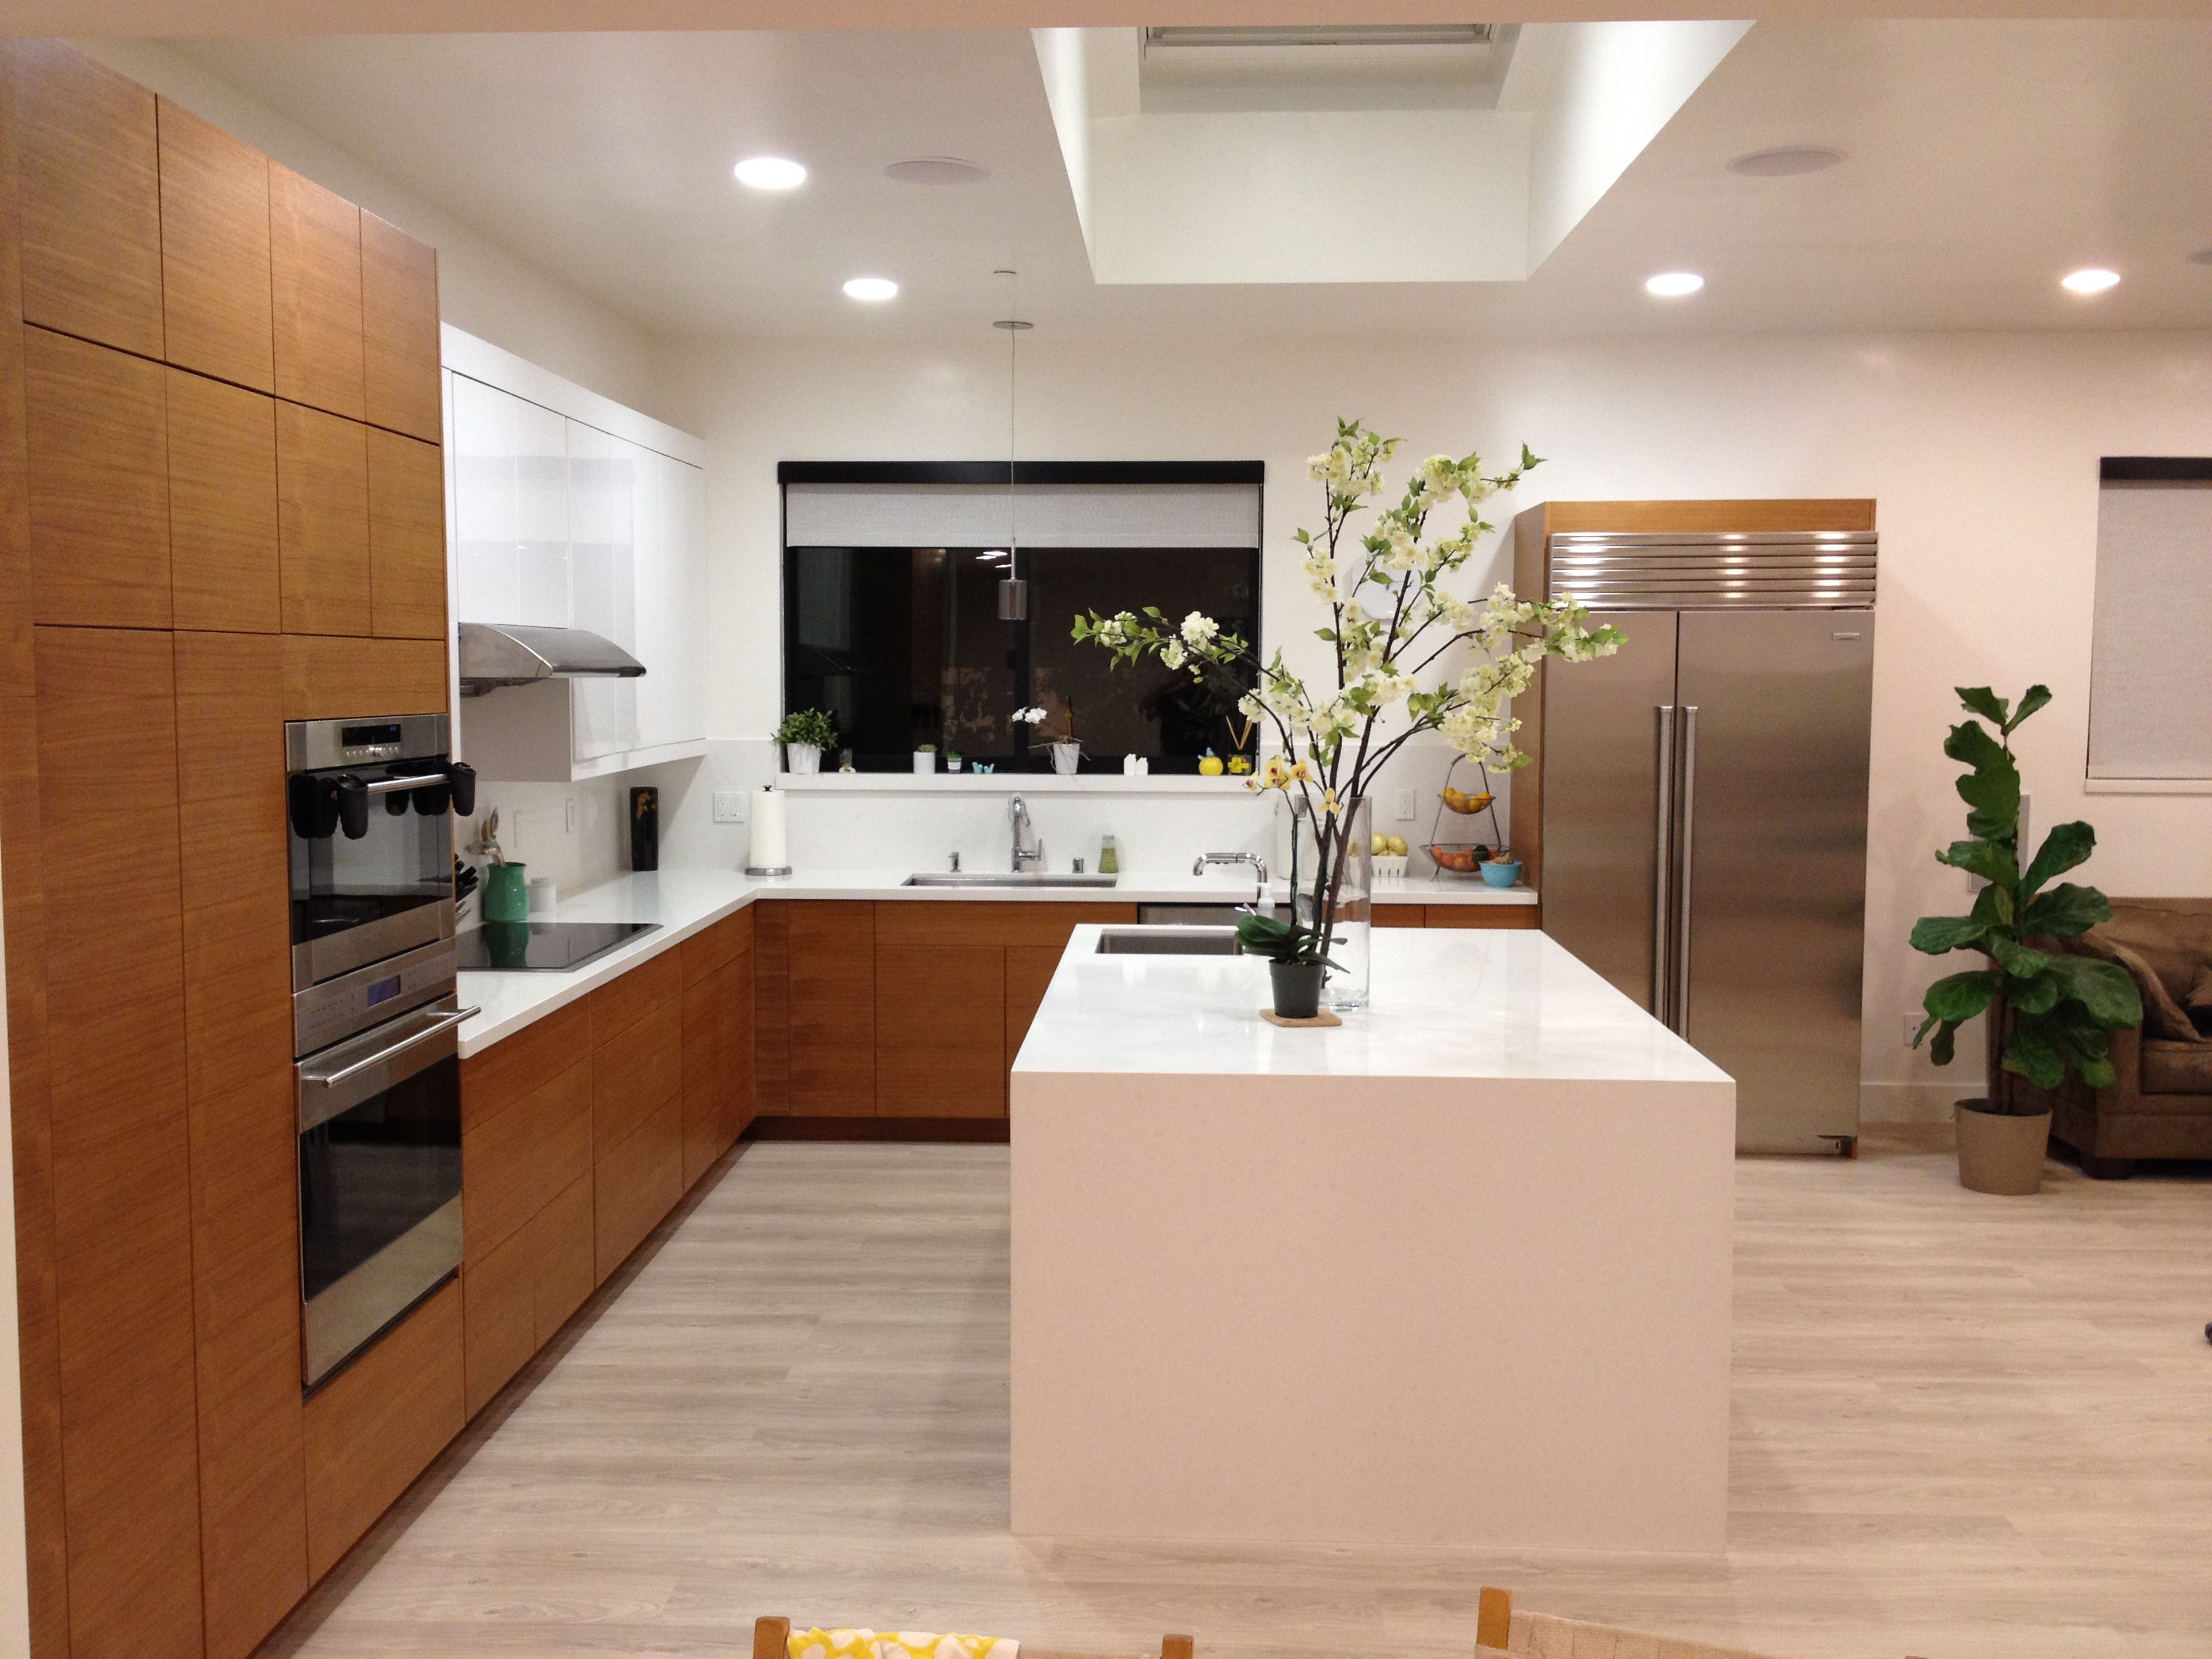 Semihandmade Doors For Ikea Cabinets Kitchen Redo Kitchen Ikea Kitchen Cabinets